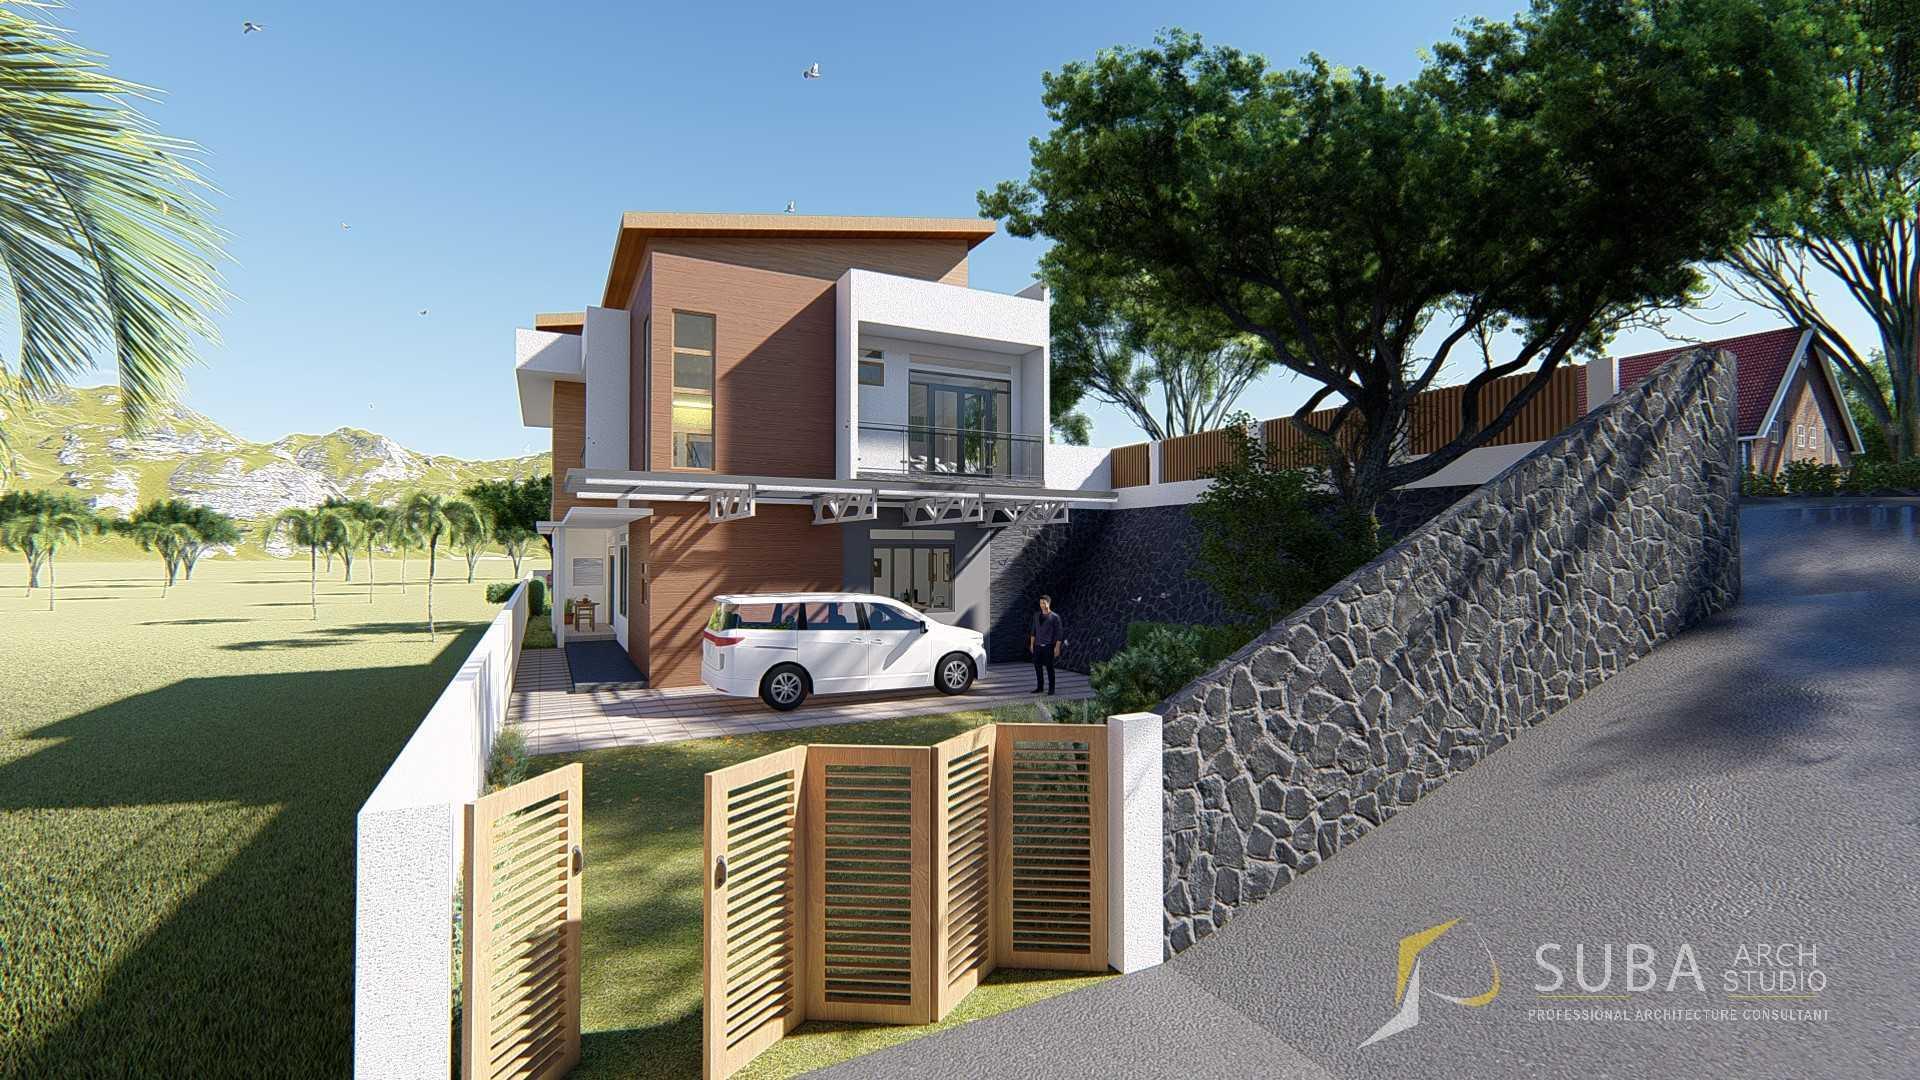 Suba-Arch Desain Rencana Rumah Tinggal 2Lt 13 X 17 @bu Wita Padang, Kota Padang, Sumatera Barat, Indonesia Padang, Kota Padang, Sumatera Barat, Indonesia Suba-Arch-Desain-Rencana-Rumah-Tinggal-2Lt-13-X-17-Bu-Wita  86842